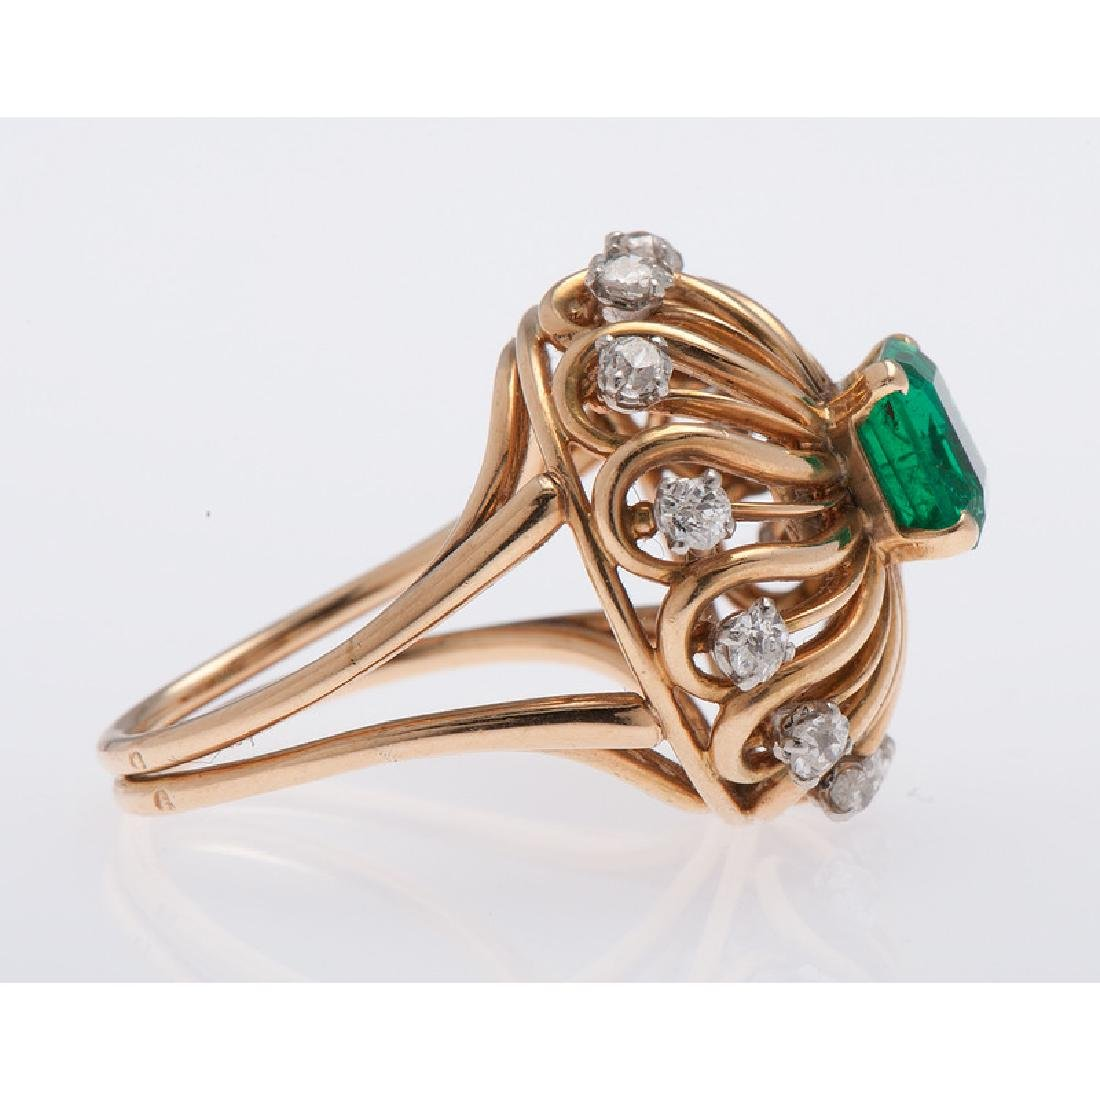 Mellerio 18 Karat Yellow Gold Emerald and Diamond Ring - 2